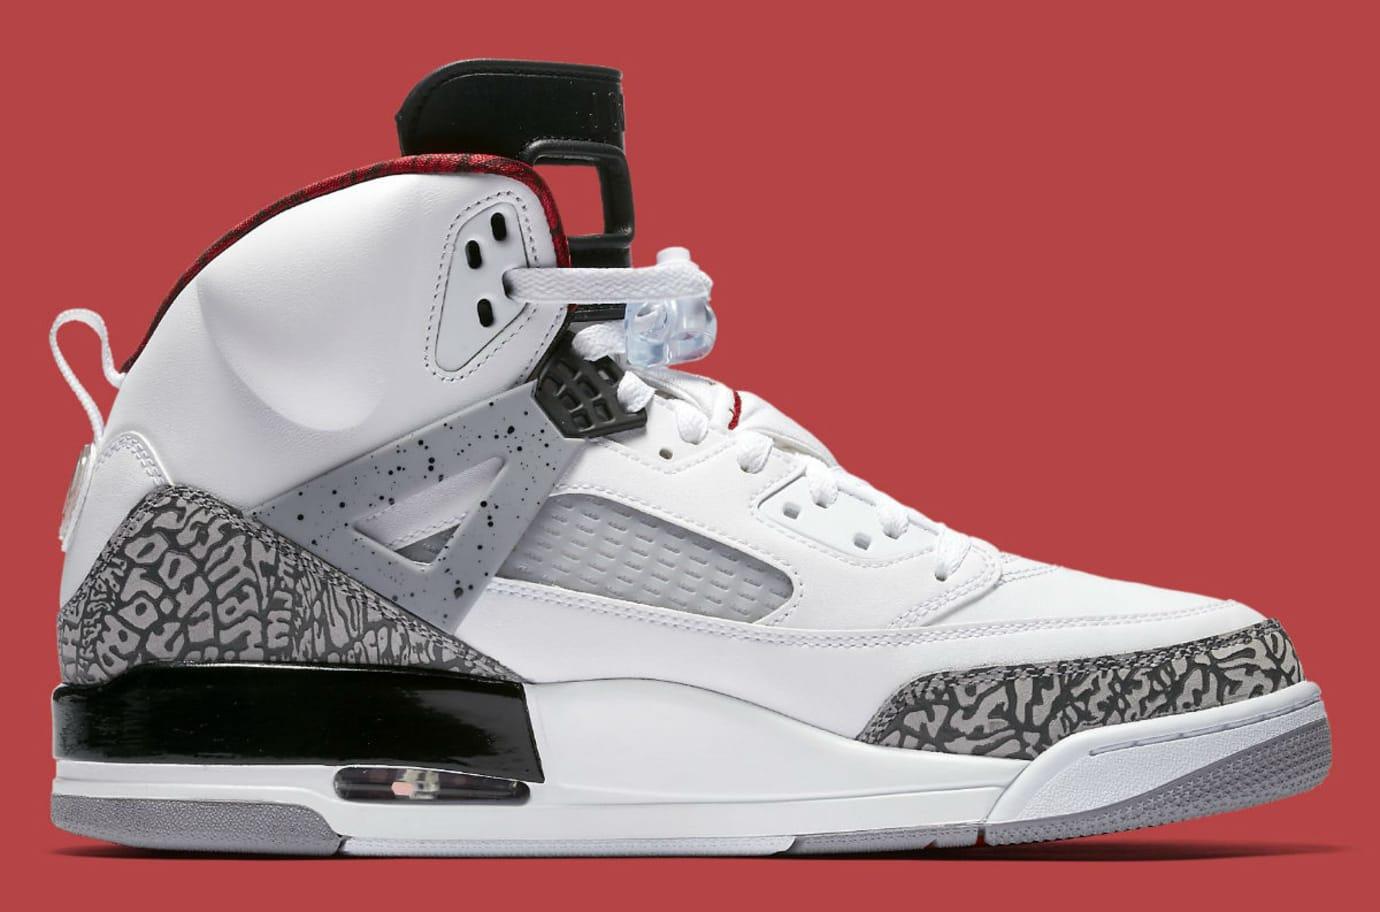 Jordan Spizike White Cement 2017 Release Date Medial 315371-122